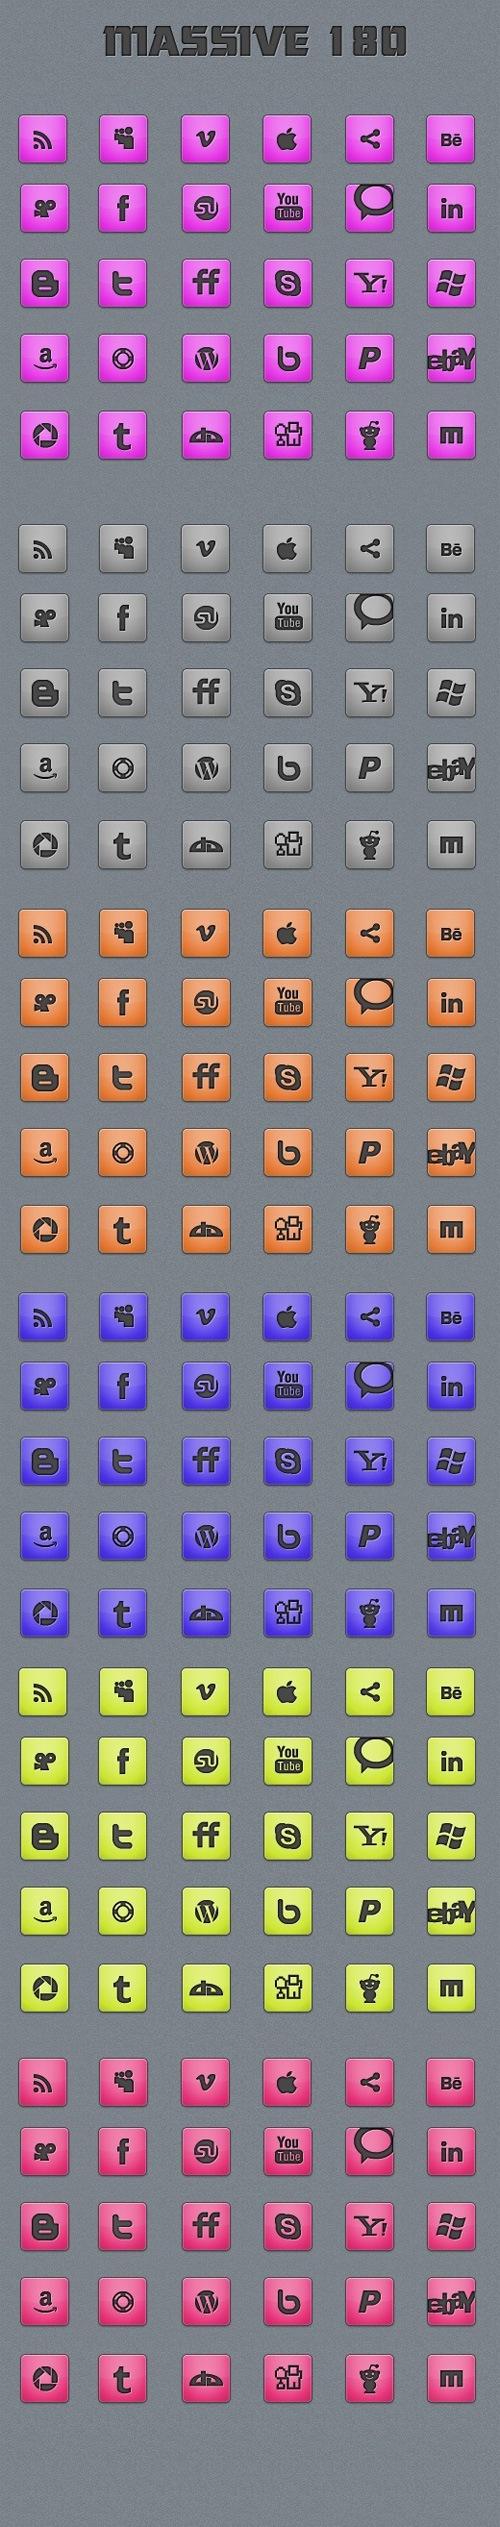 180massive-icons